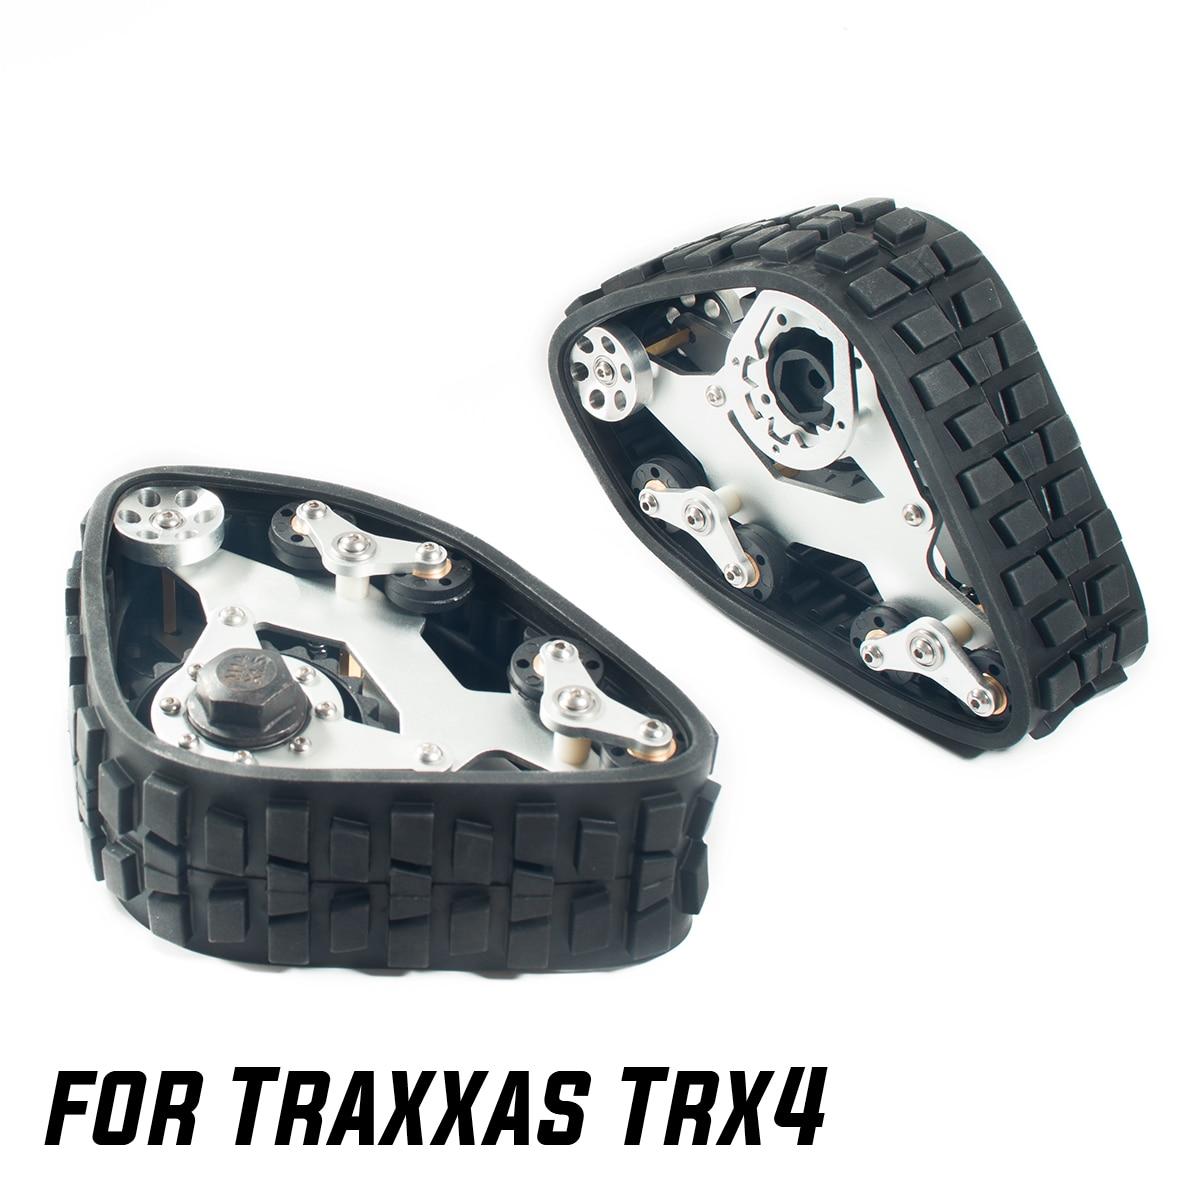 RC Aluminum All Terrain Track Muddy Road Snow Tires For 1/10 RC Crawler Car Traxxas TRX4 SCX10 D90 Defender Upgrade Parts enlarge